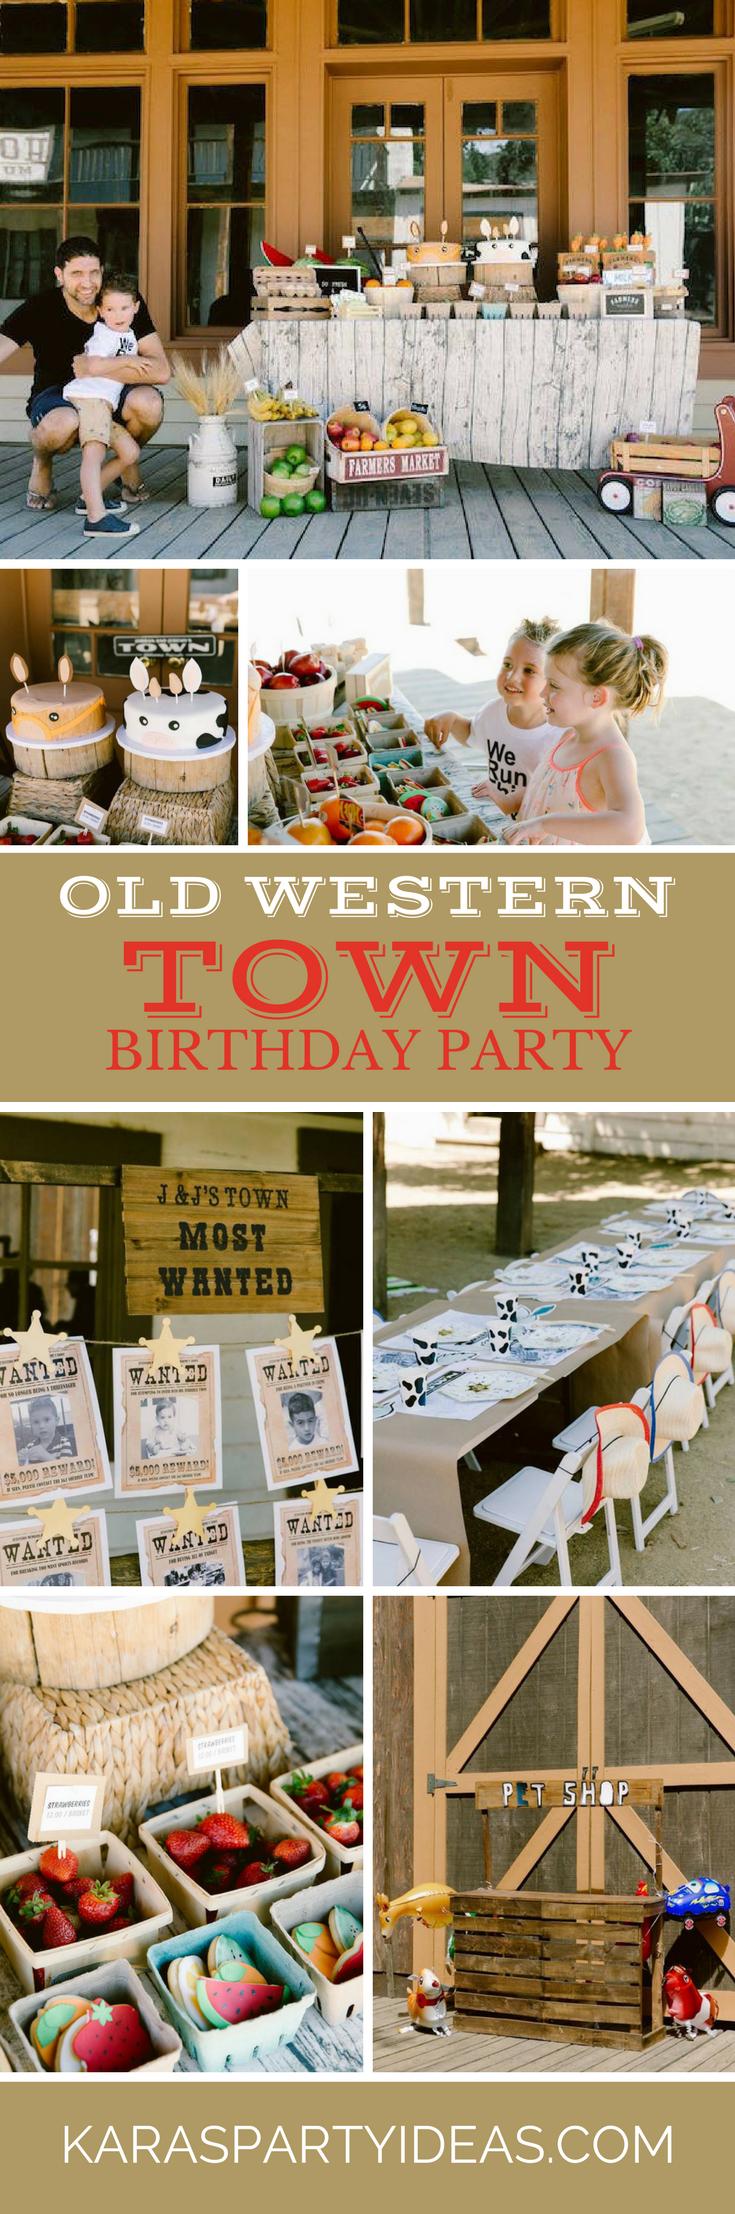 Old Western Town Birthday Party via Kara's Party Ideas - KarasPartyIdeas.com